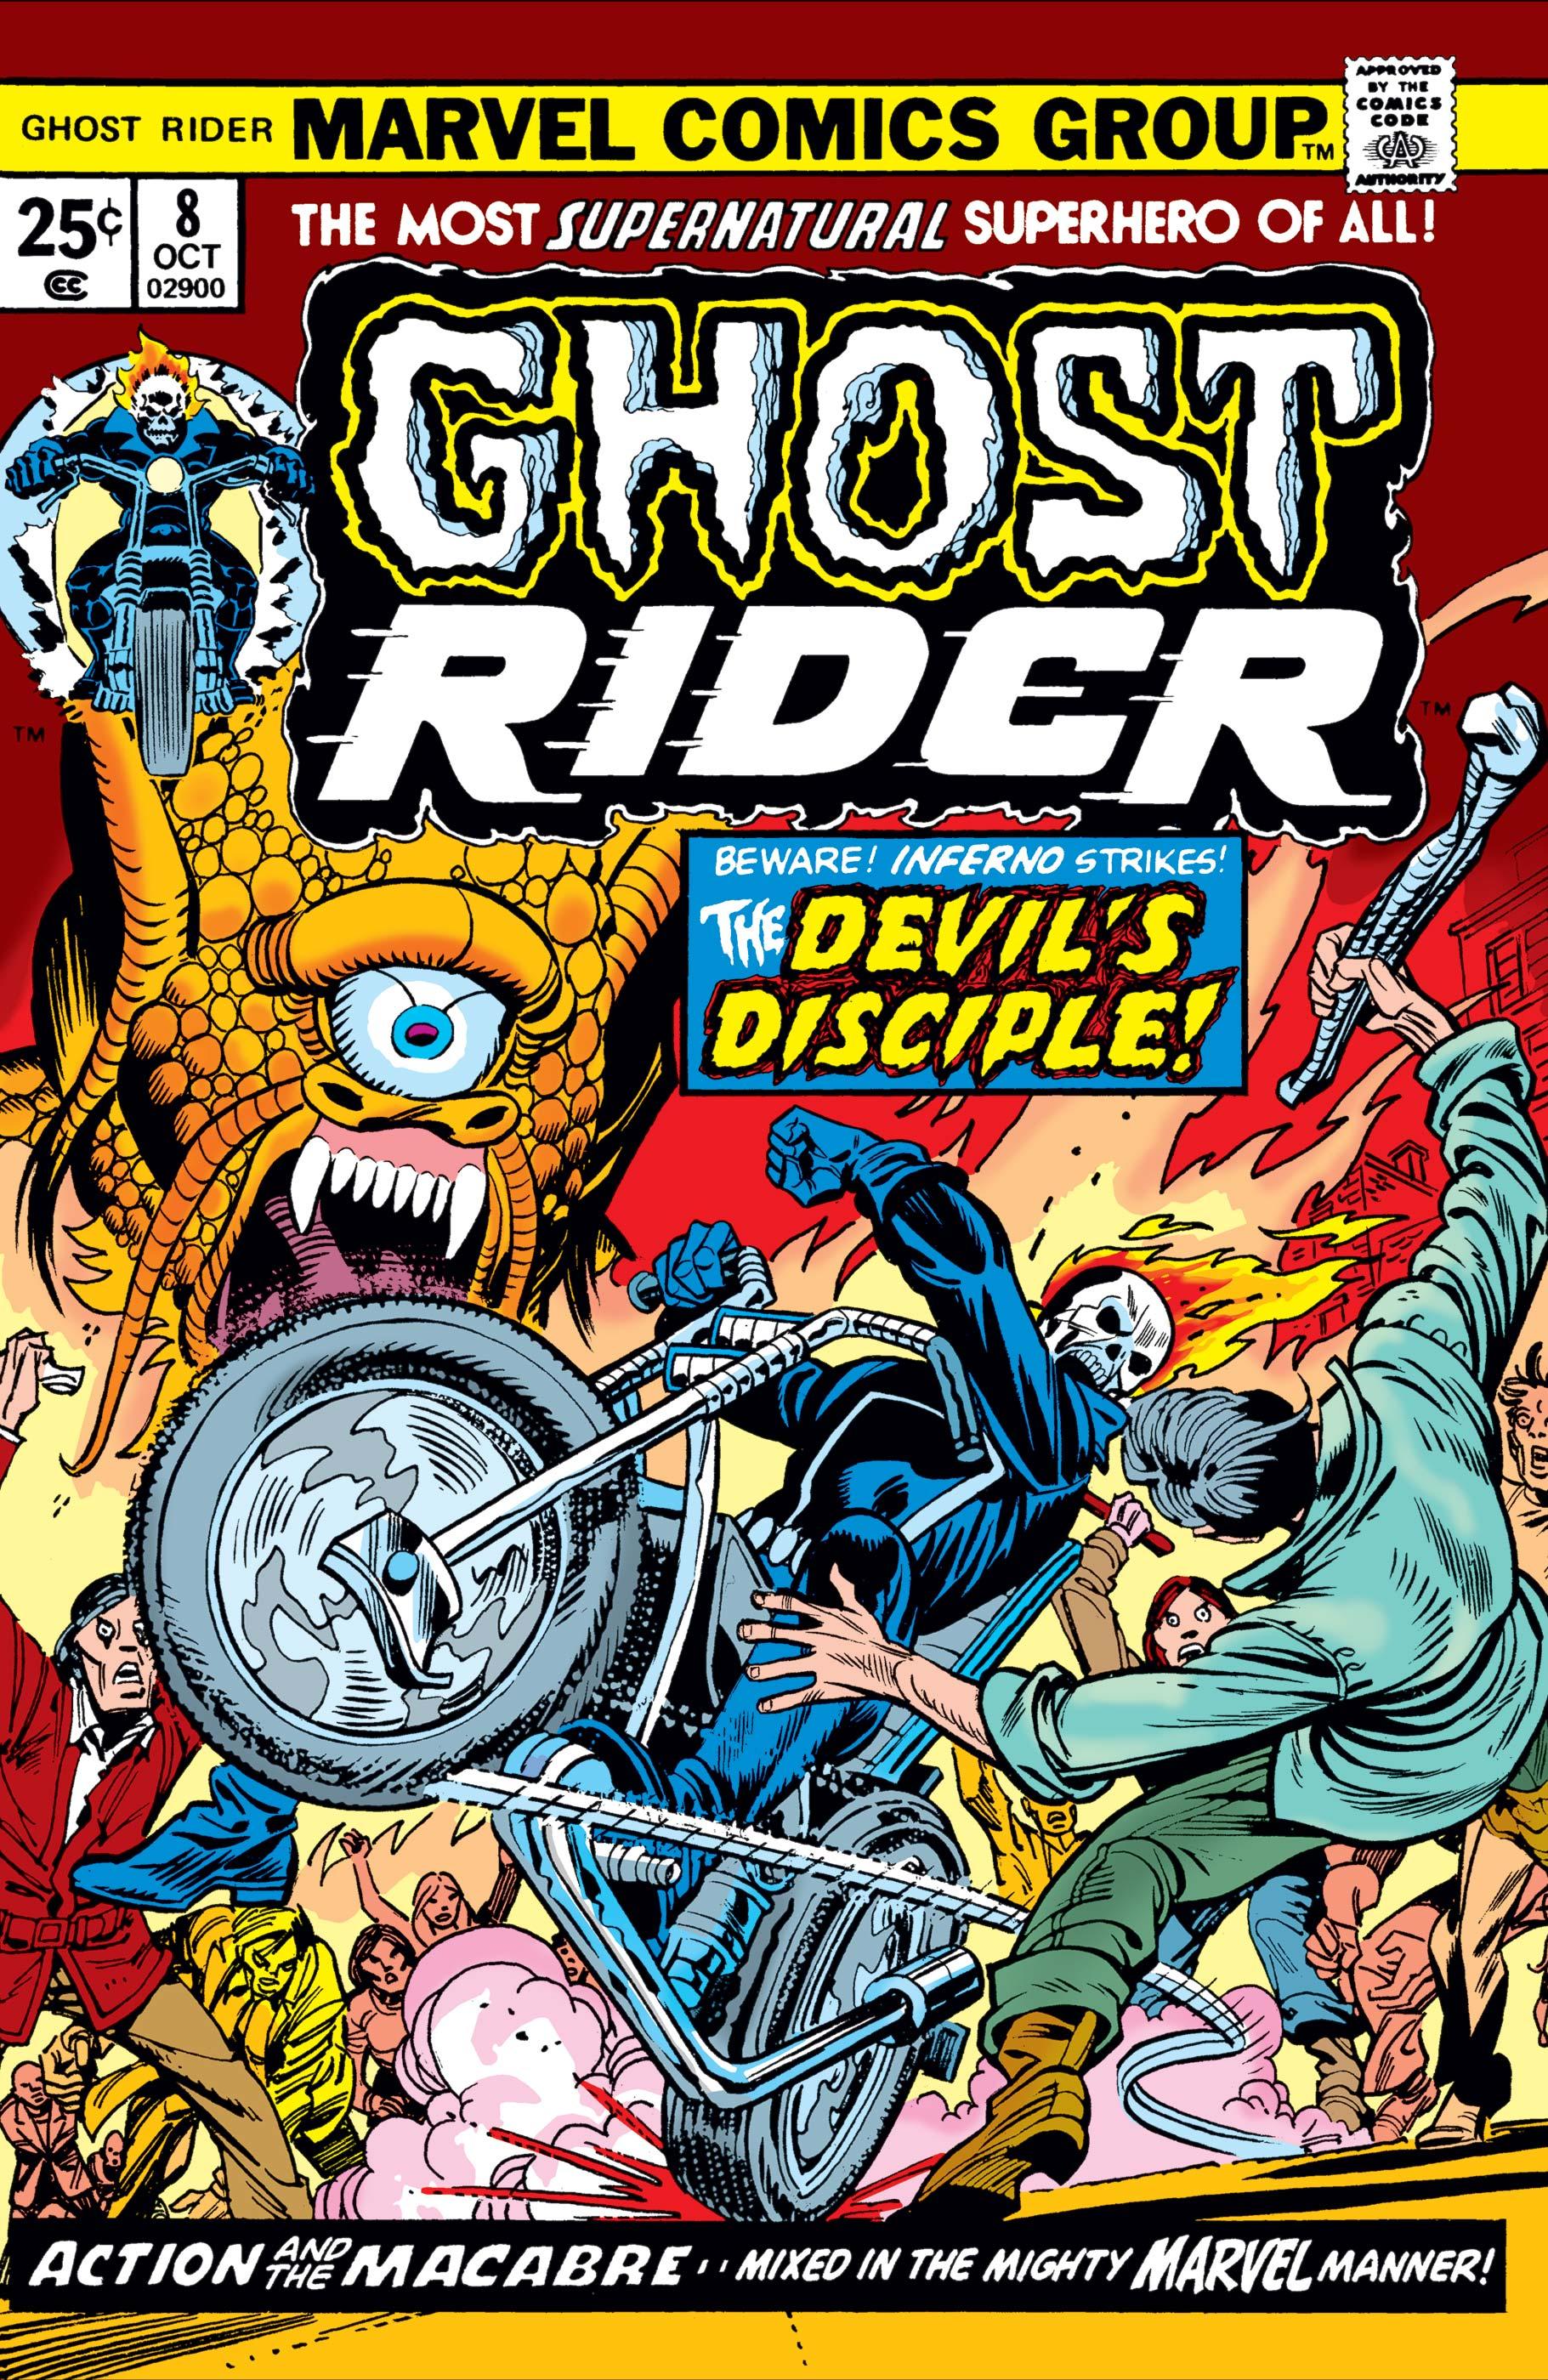 Ghost Rider (1973) #8